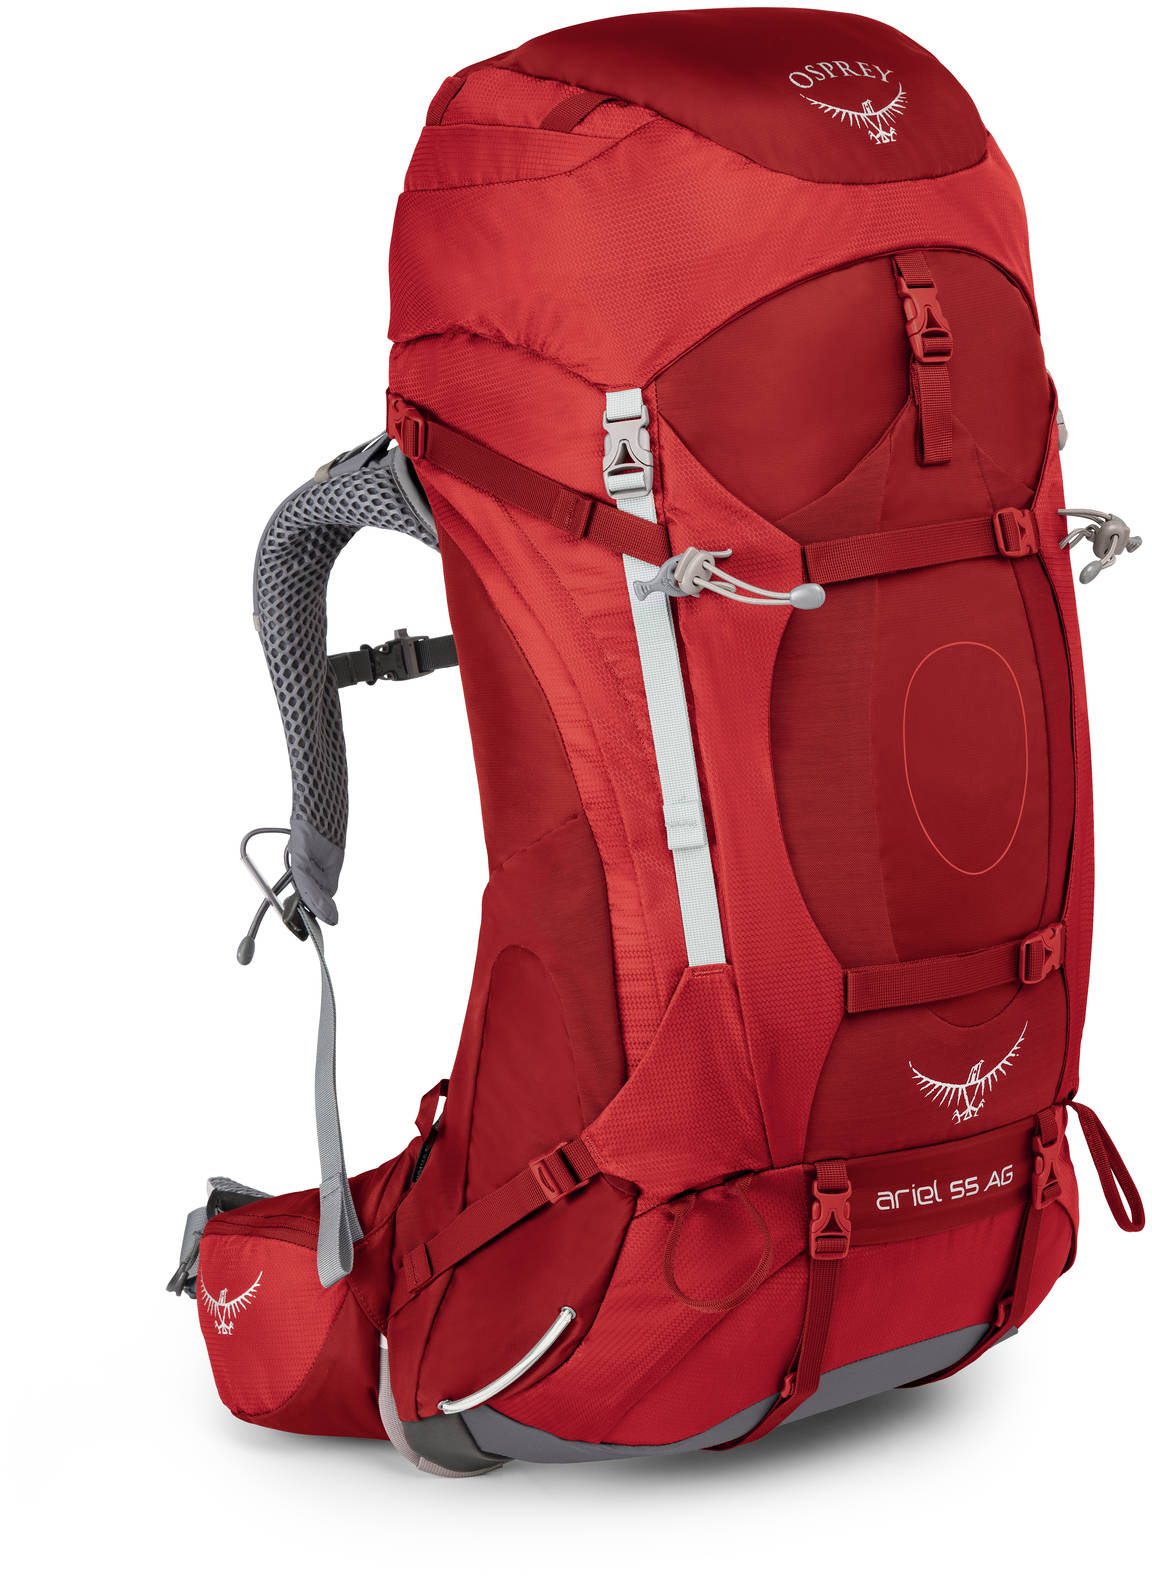 Туристические рюкзаки Рюкзак туристический женский Osprey Ariel AG 55 Ariel_AG_55_S17_Side_Picante_Red_web.jpg